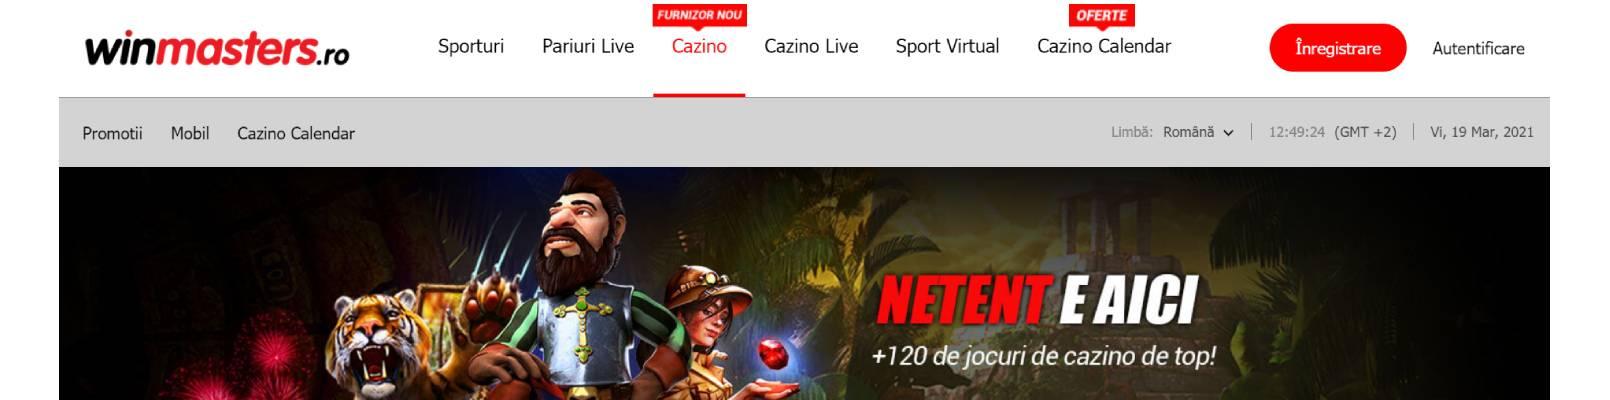 motive joc winmasters casino